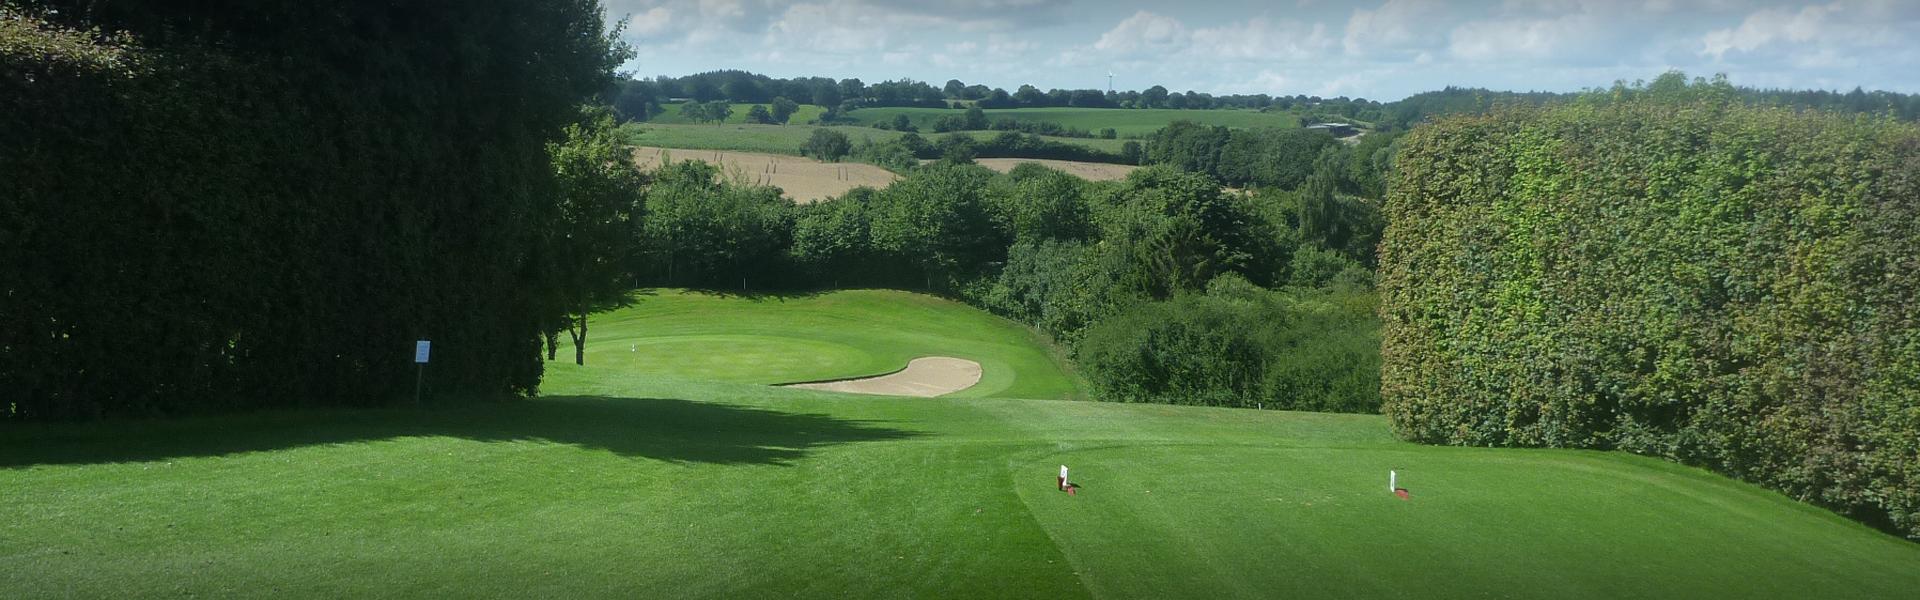 Unsere Golfplatzplanung Förde Golf Club Glücksburg ...